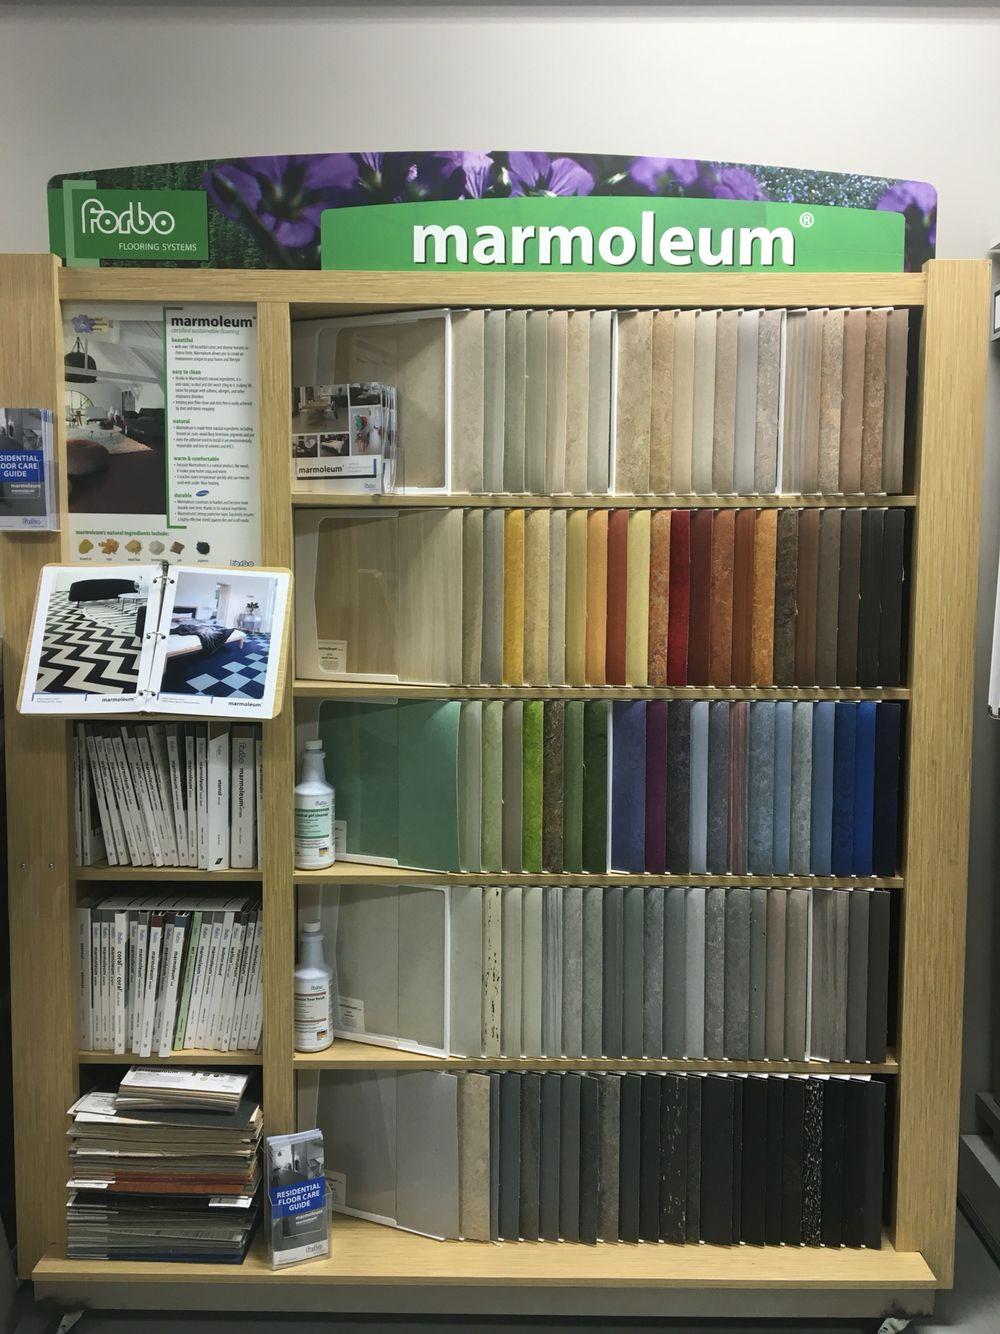 Our Forbo Marmoleum Display Marmoleum Woodside Time Inc